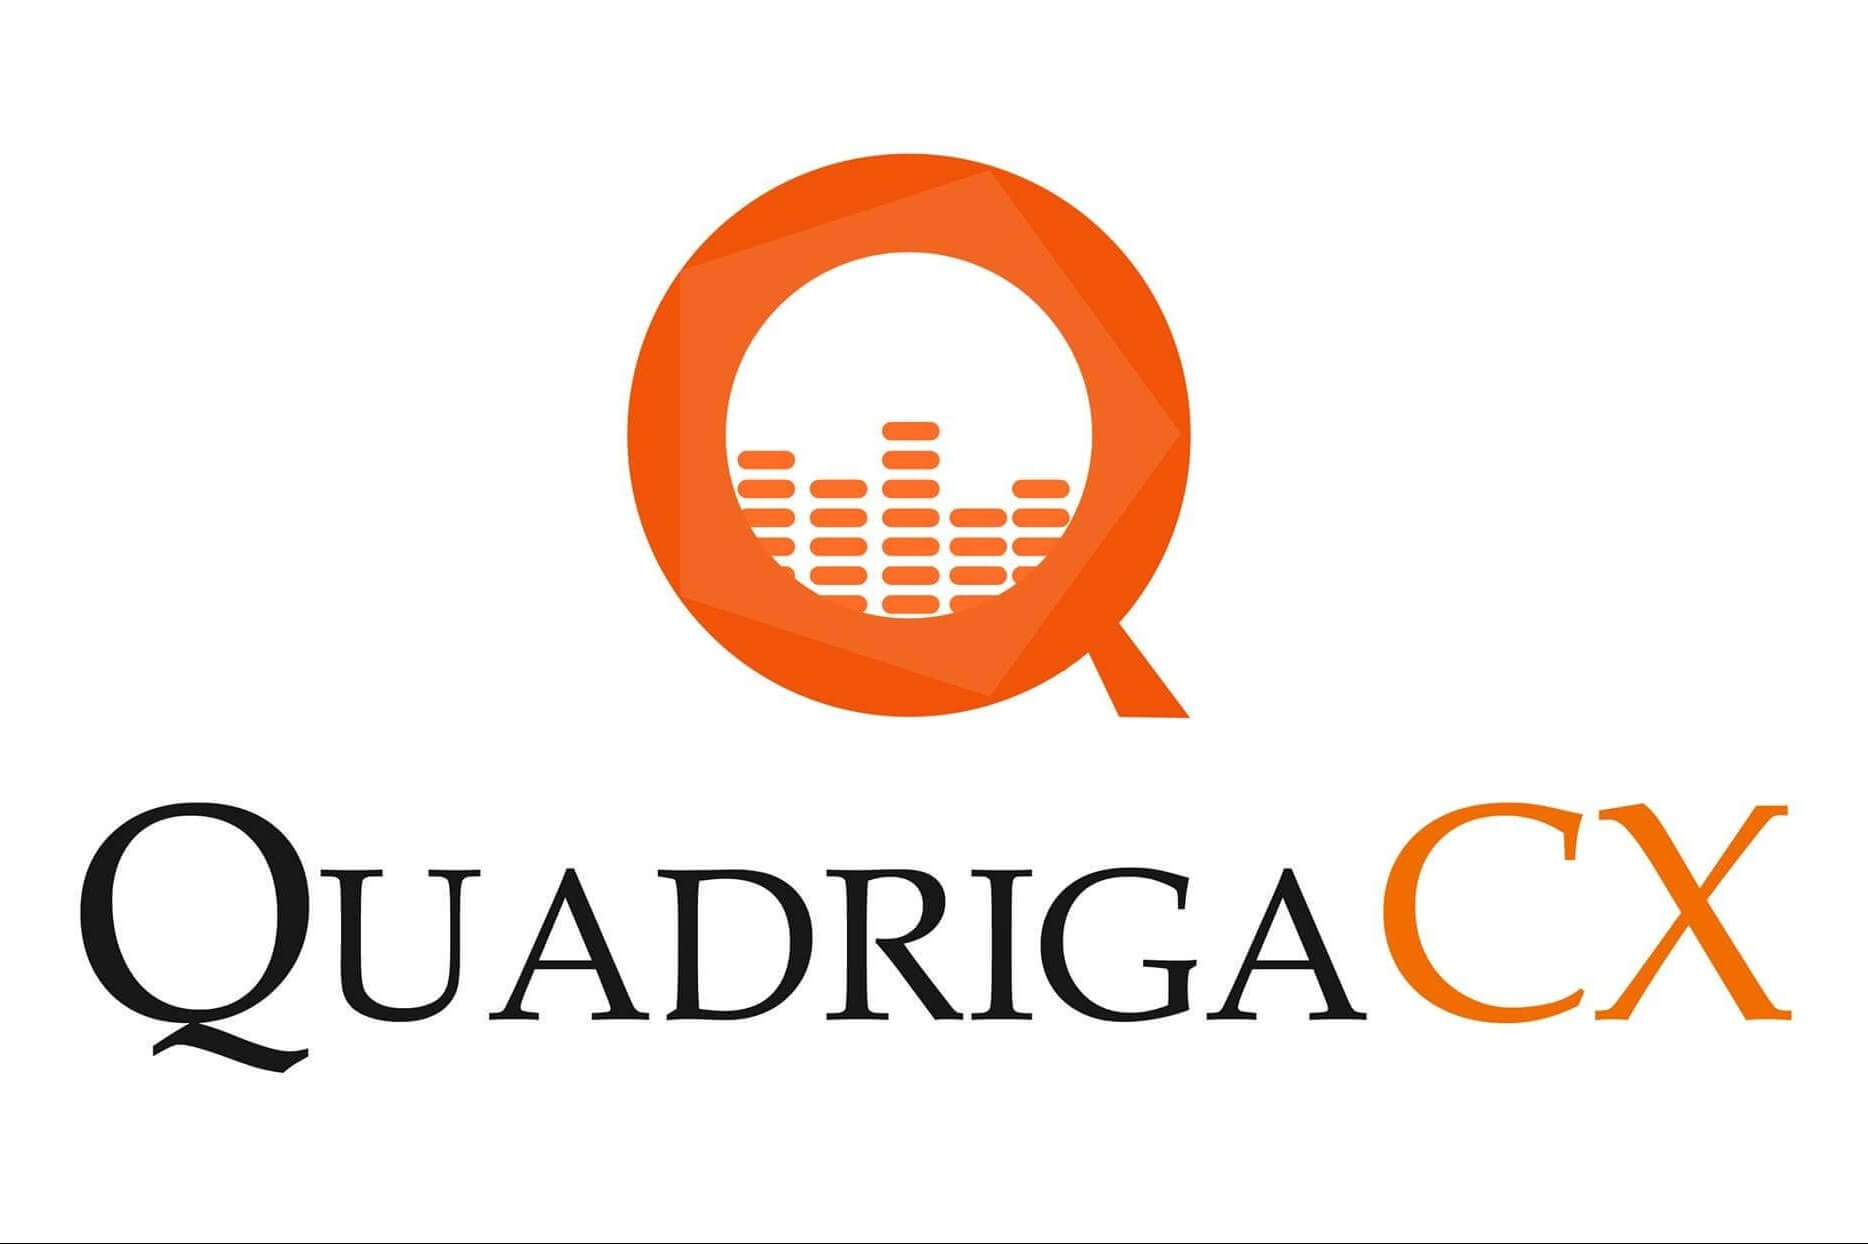 QUADRIGACX – UNFOLDING THE MYSTERY